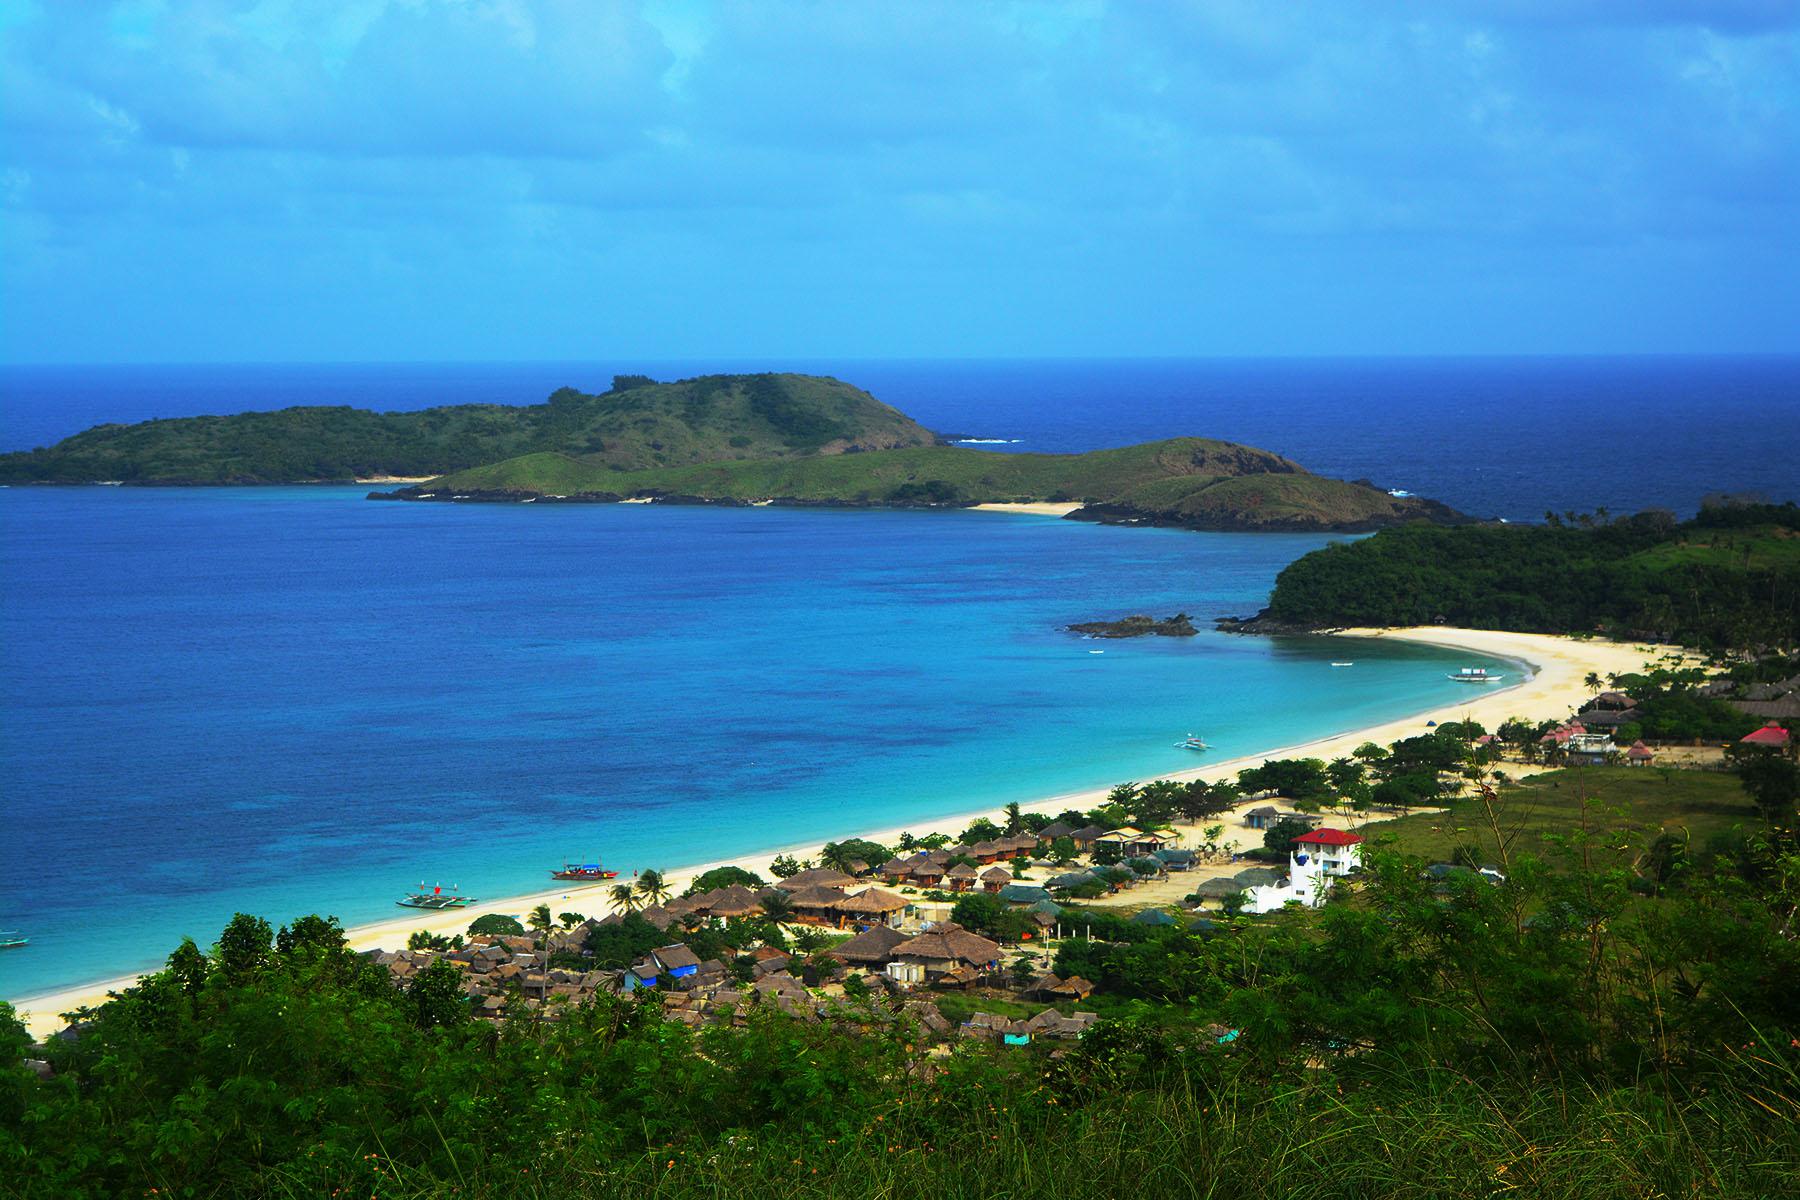 How To Get To Calaguas Island